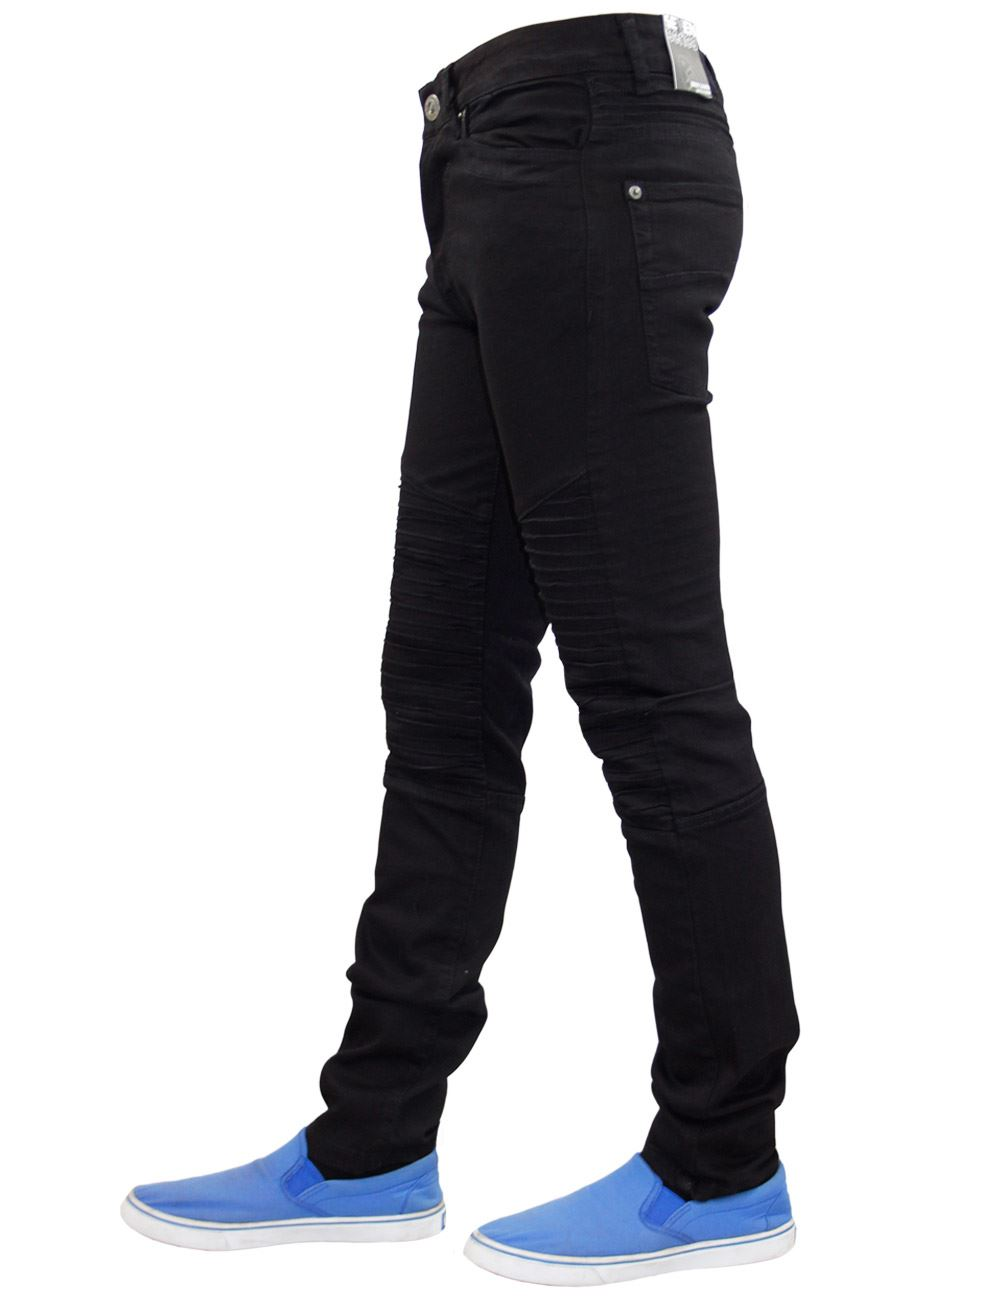 Men-Skinny-Jeans-Stretch-Slim-Fit-Zip-Fly-Denim-Biker-Pants-Trousers-Sizes-28-38 thumbnail 4